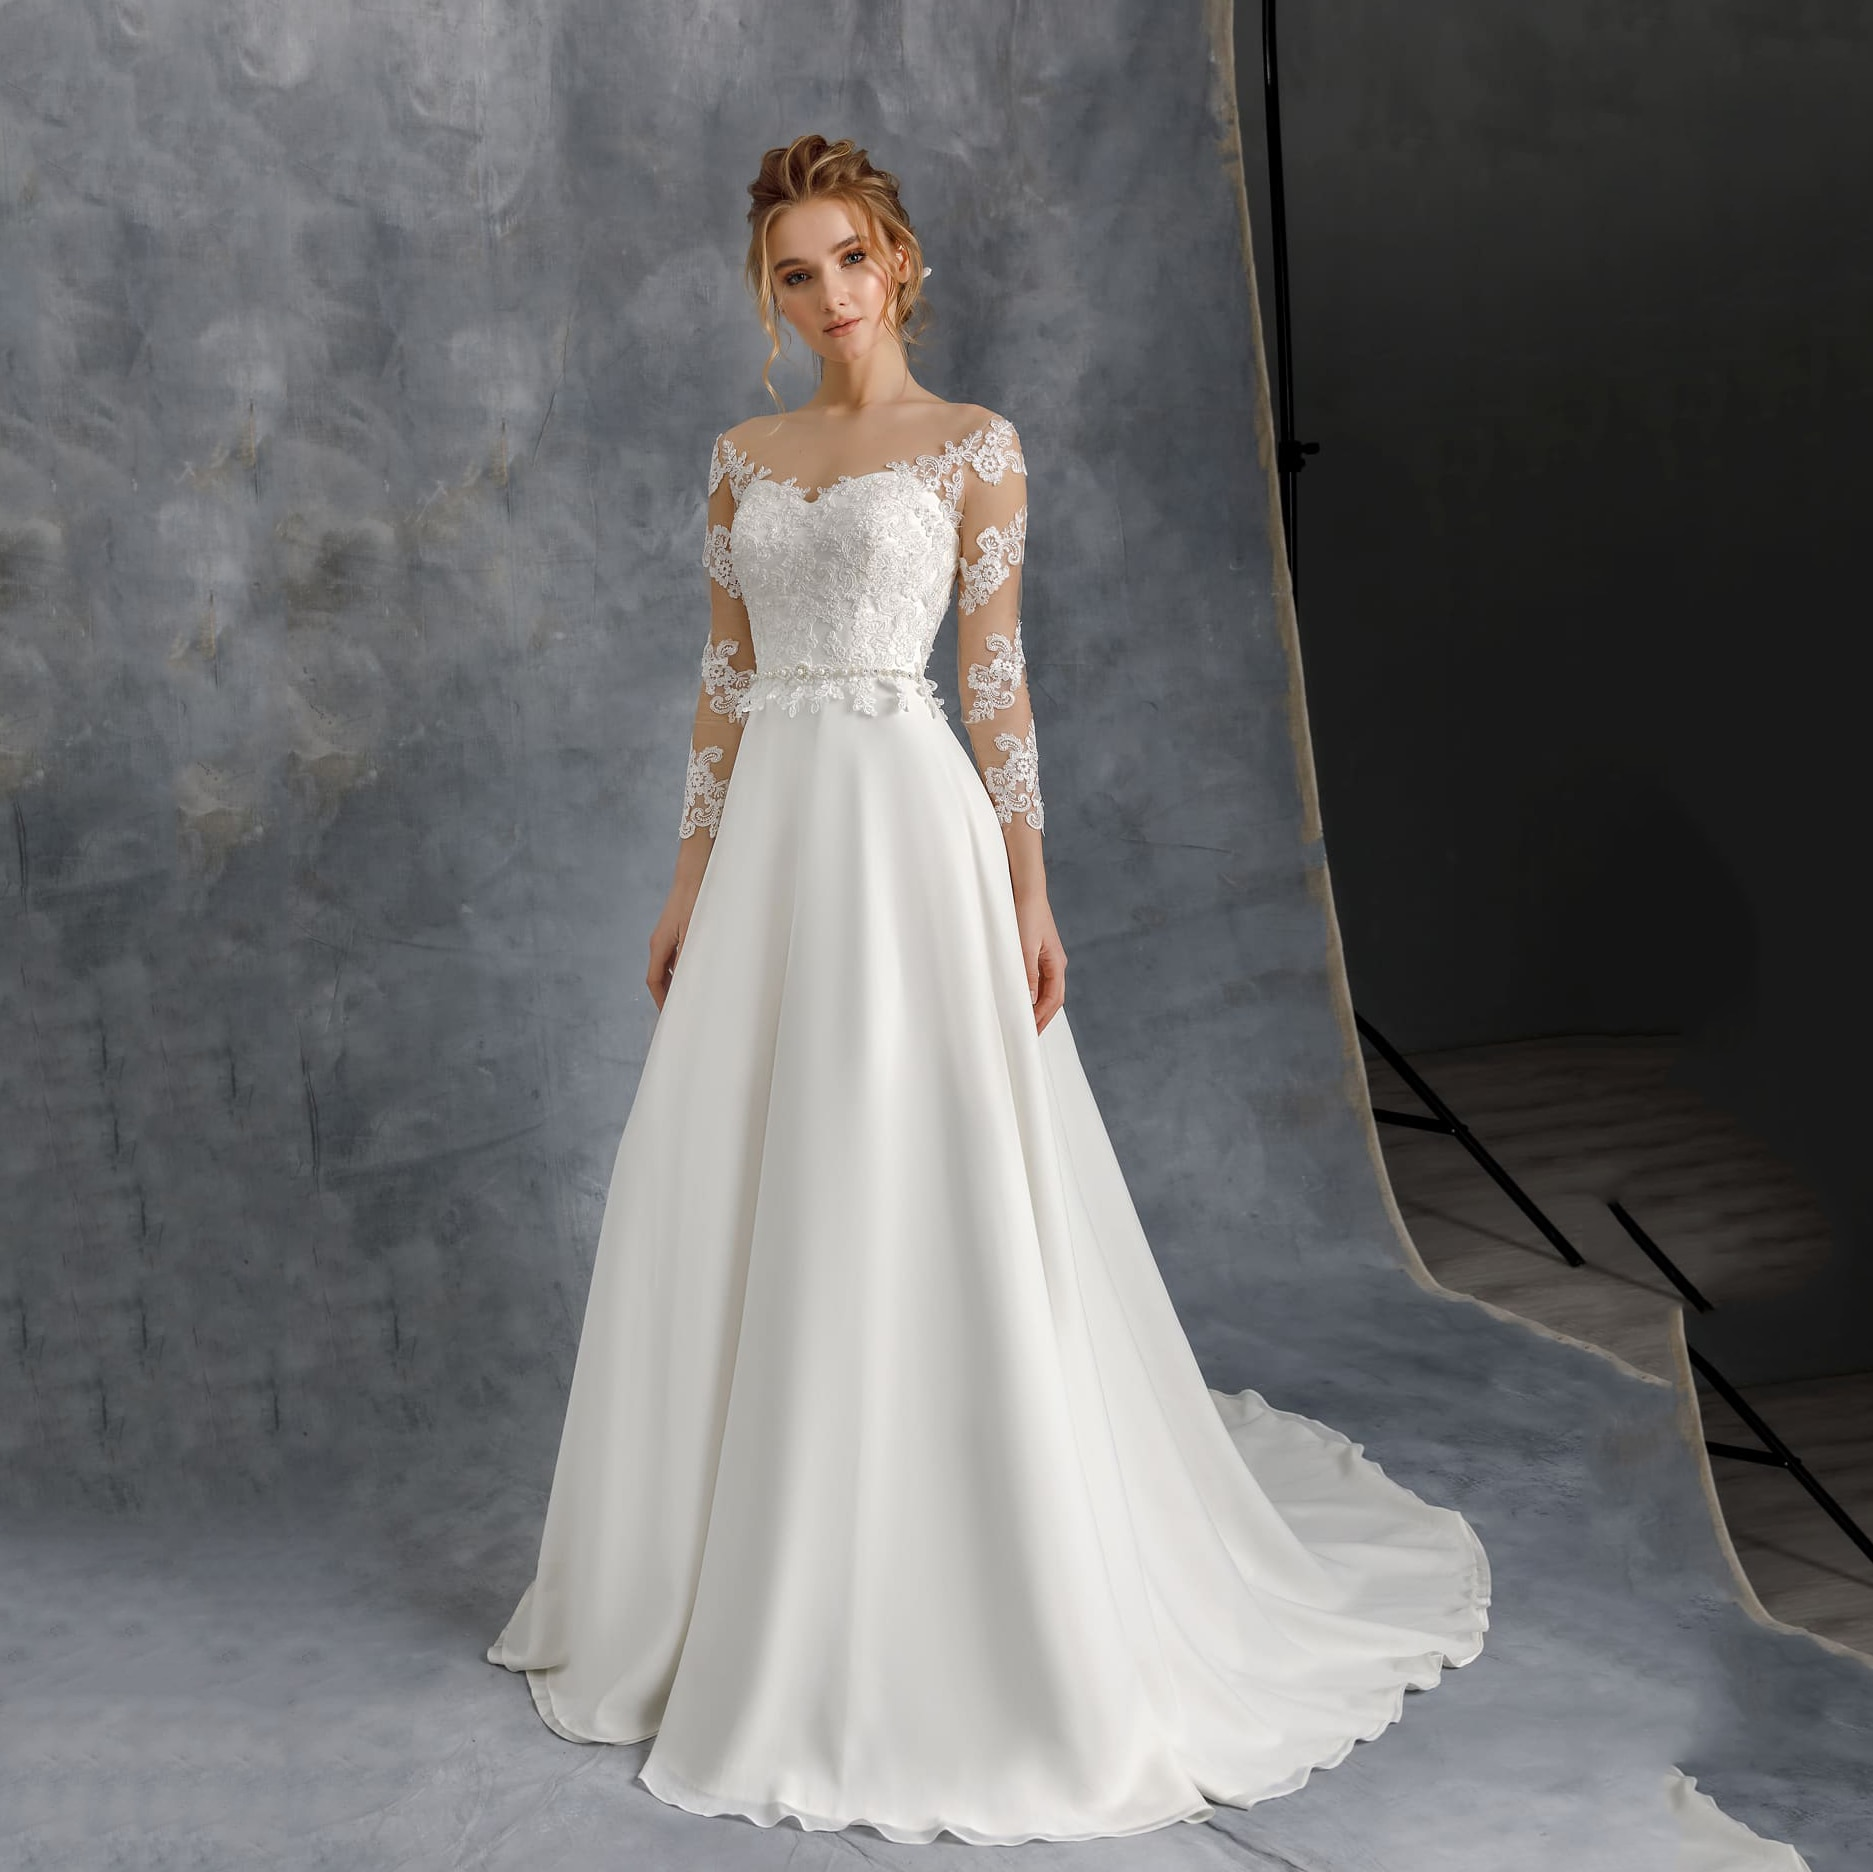 2020 Wedding Dresses Chiffon A Line Sheer O Neck Long Sleeve Bridal Gowns Beading Belt Applique Lace Plus Size R